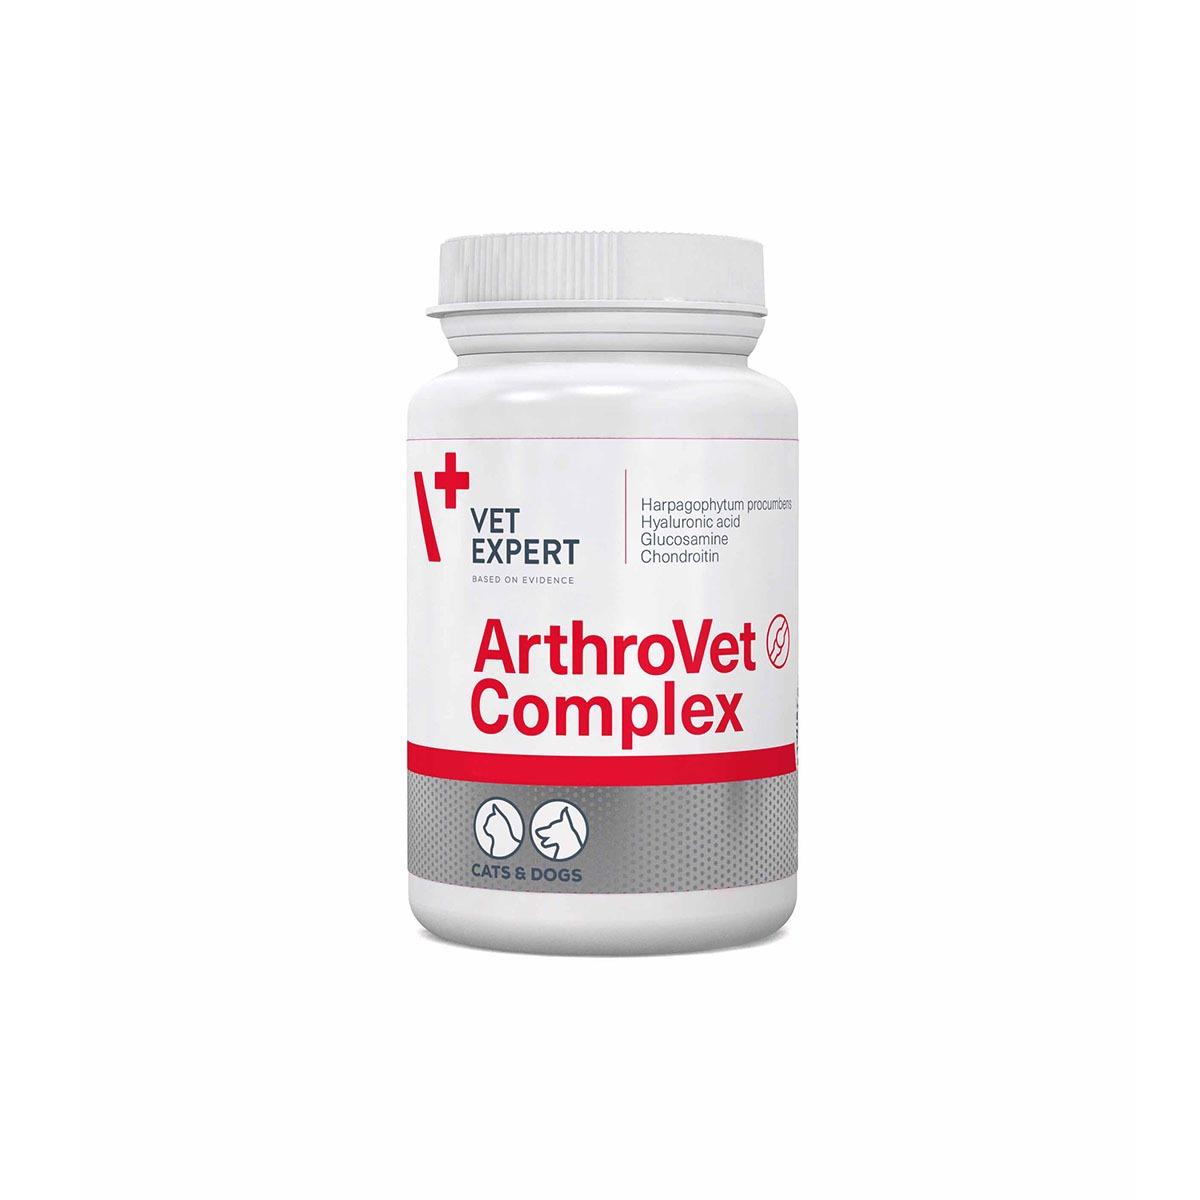 VetExpert ArthoVetix HA Complex 60 & 90 Tabs Diätergänzungsfuttermittel Tierarztbedarf, Veterinärbedarf, Veterinärmedizin, Praxisbedarf, Ergänzungsfuttermittel, Tierarztprodukten, Tierapotheke, Tierpflegeprodukte